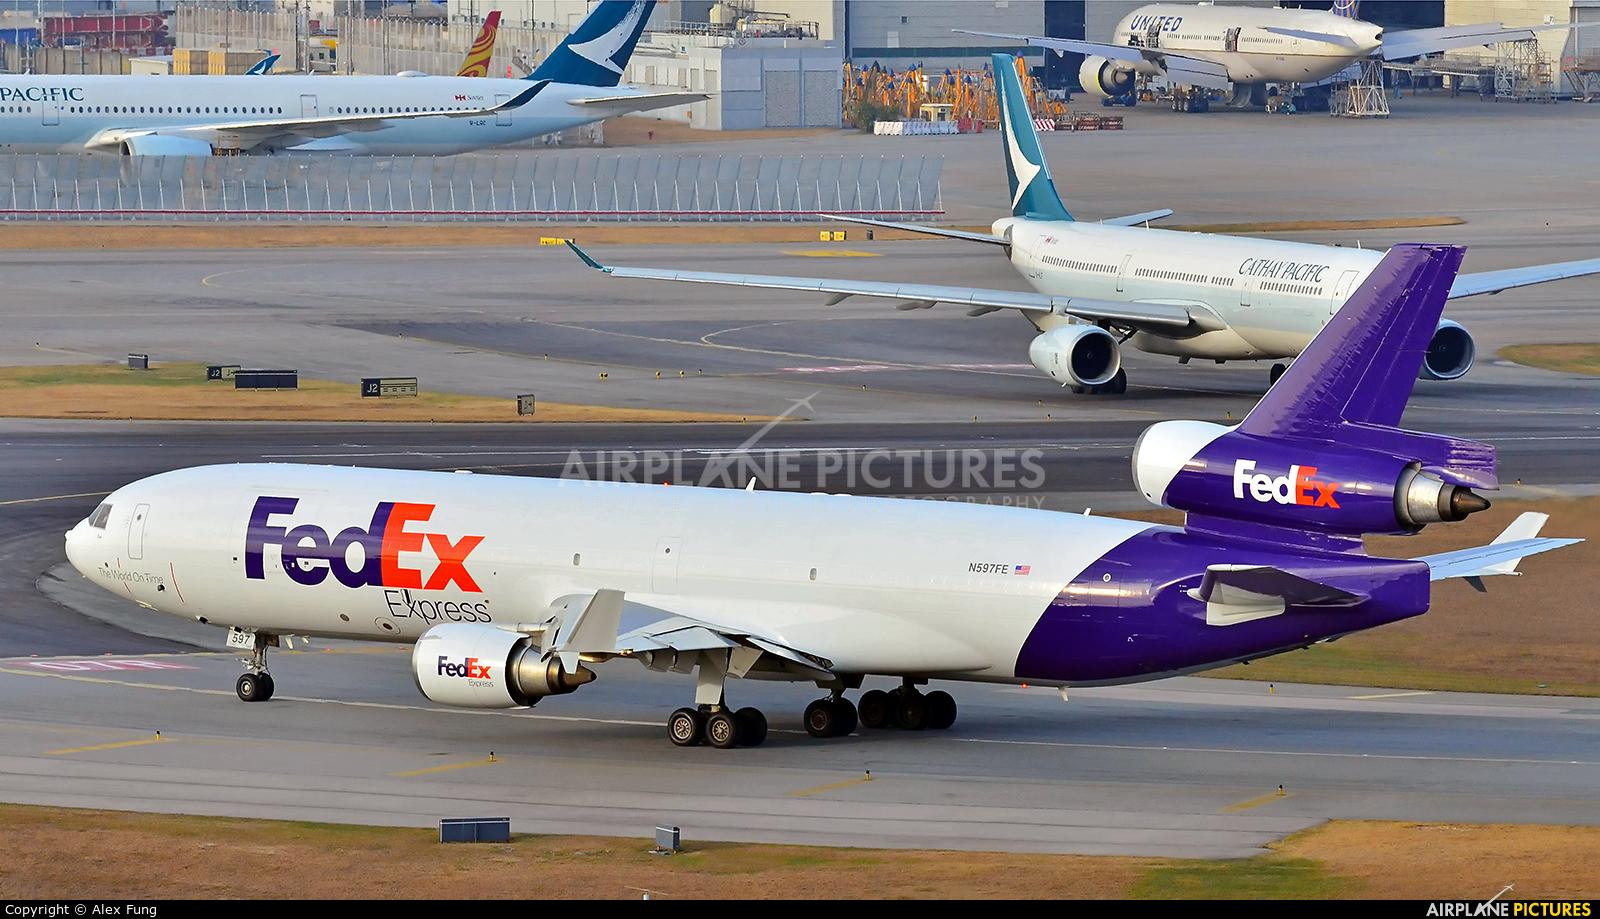 FedEx Federal Express N597FE aircraft at HKG - Chek Lap Kok Intl